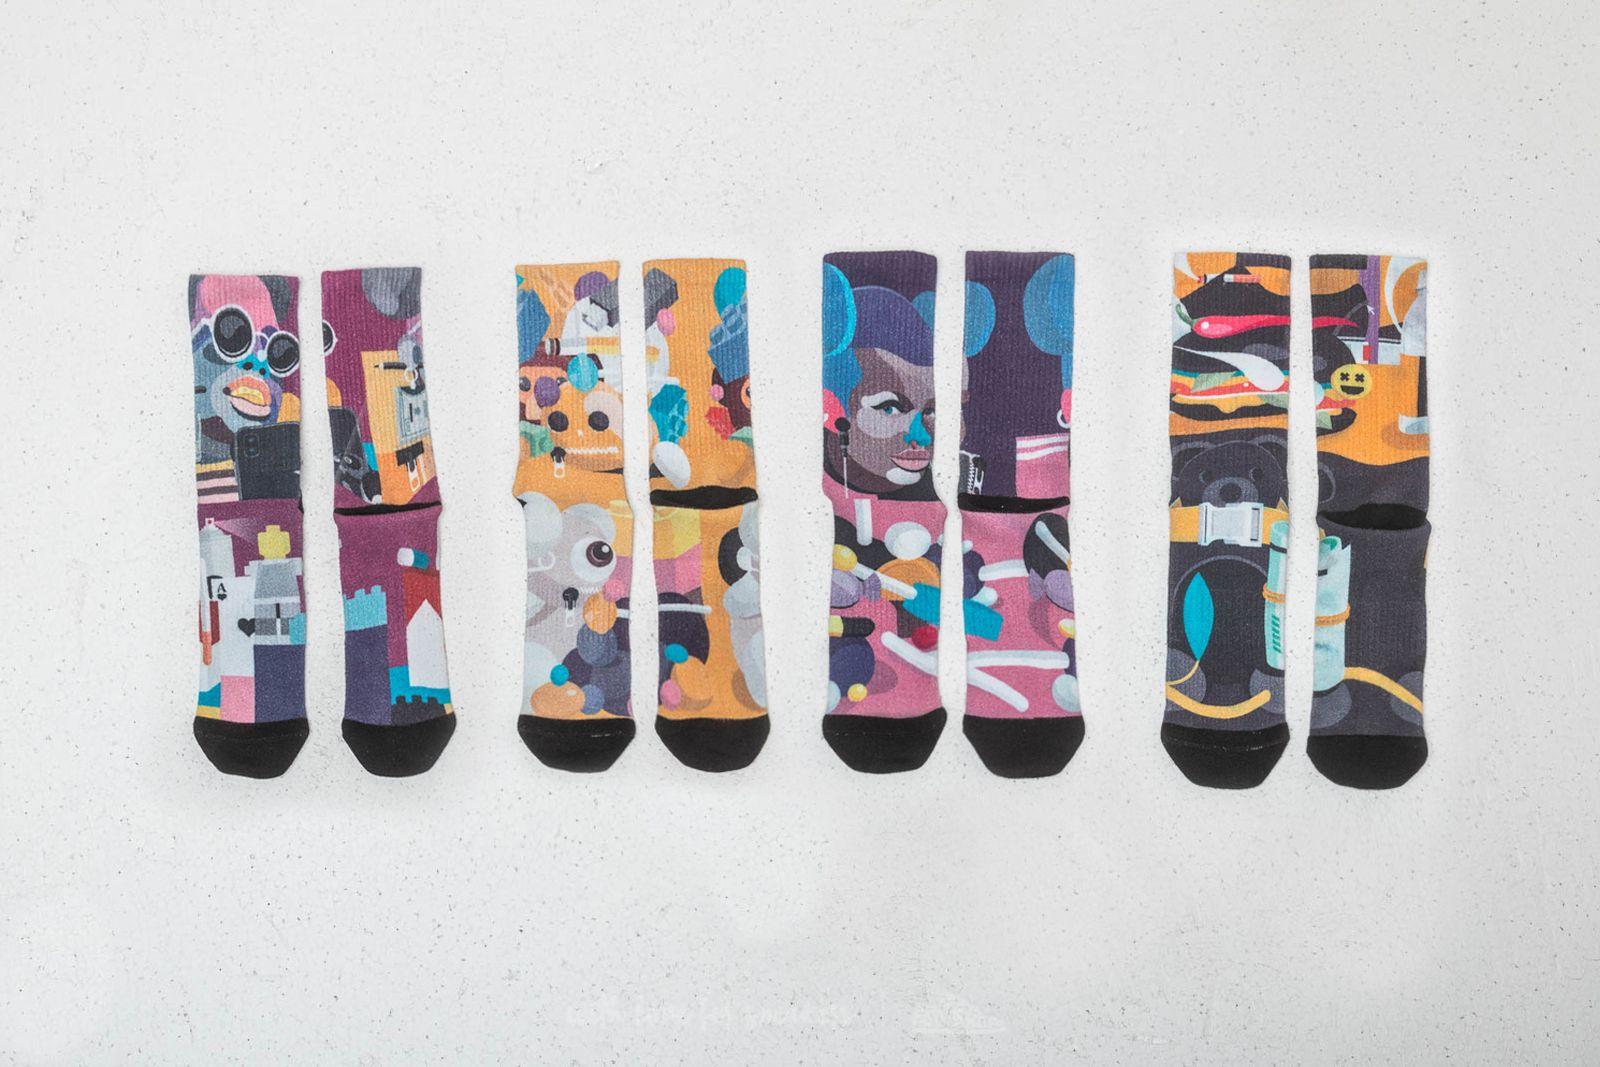 Socks Moon Socks x Marek Mraz Pack Socks